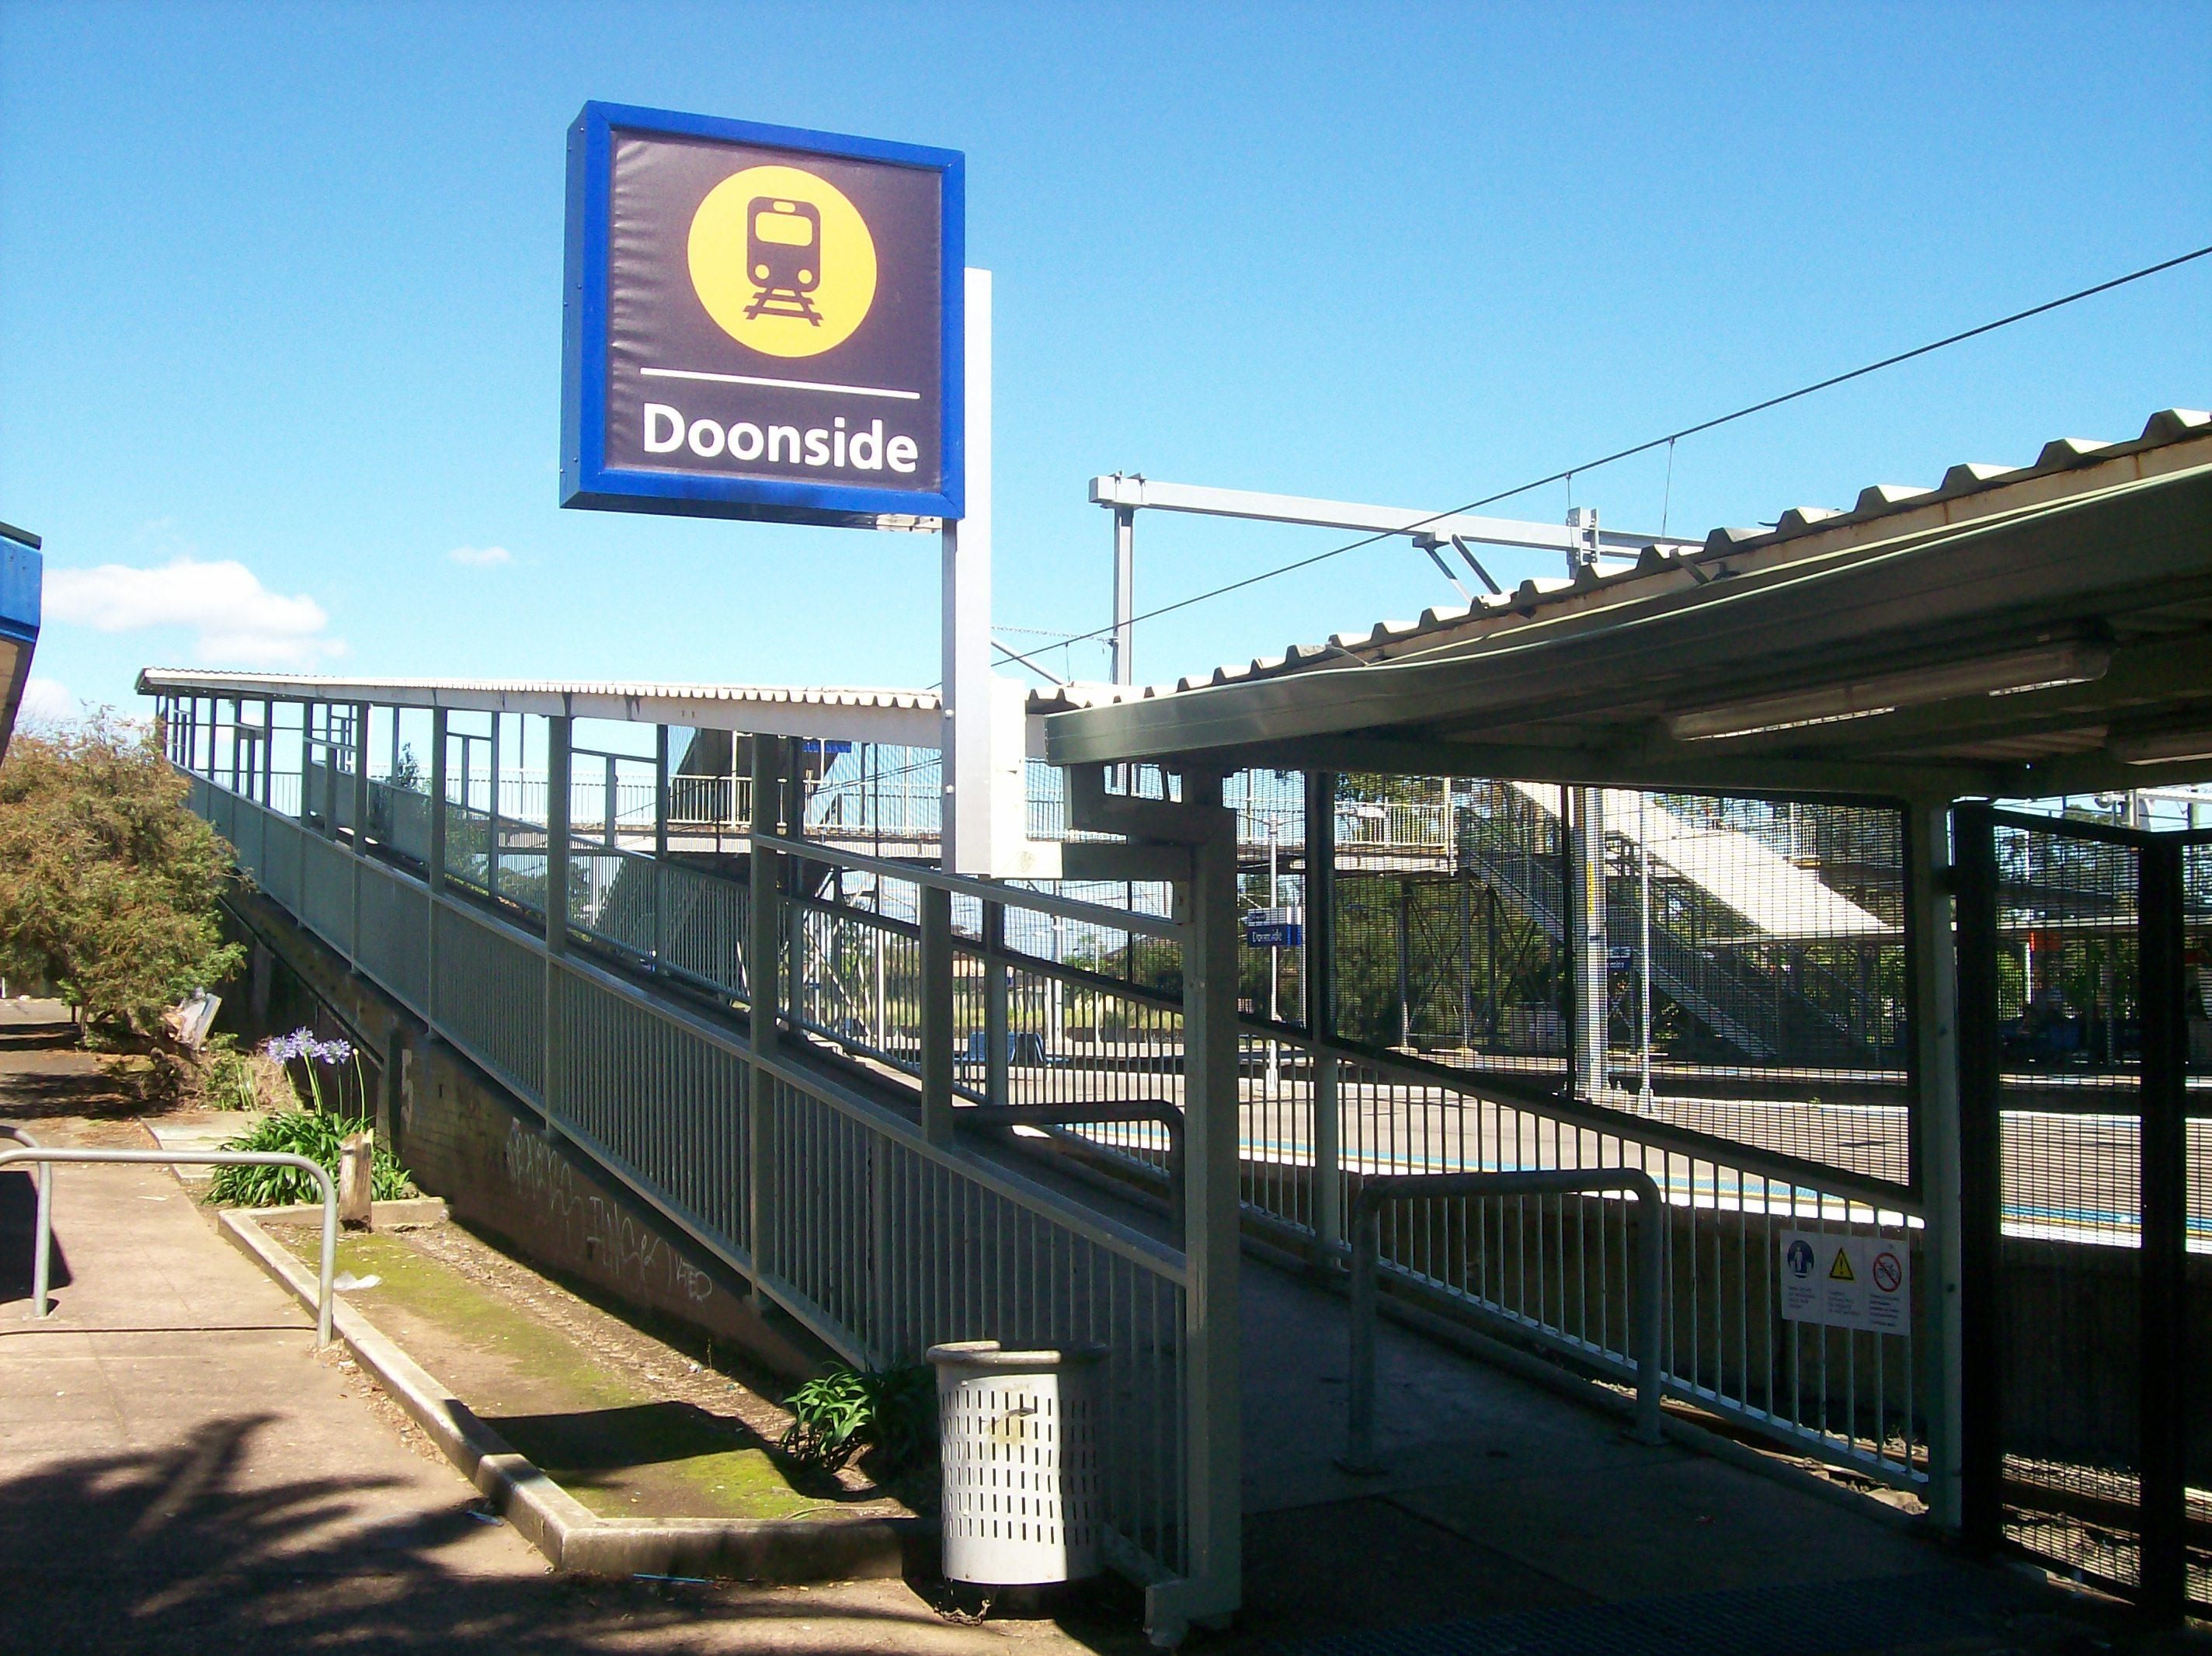 file doonside railway station east